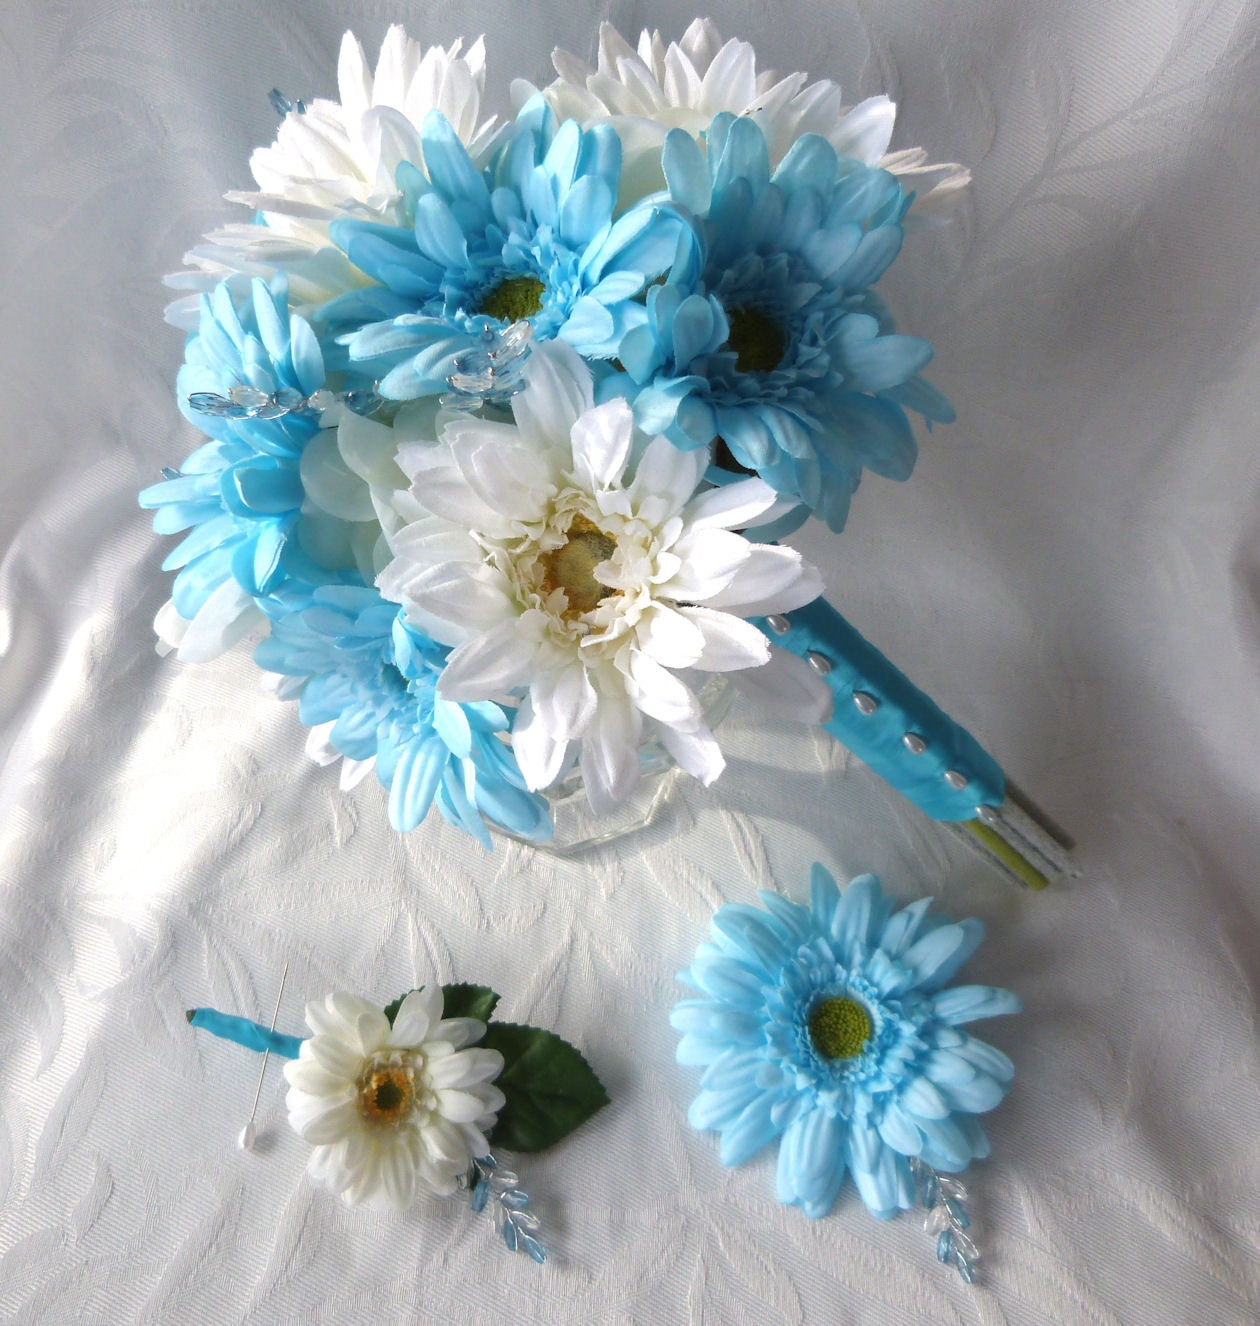 Bridal Bouquets Silk Flowers: Silk Flower Bridal Bouquet Boutonnieres Malibu And Creme